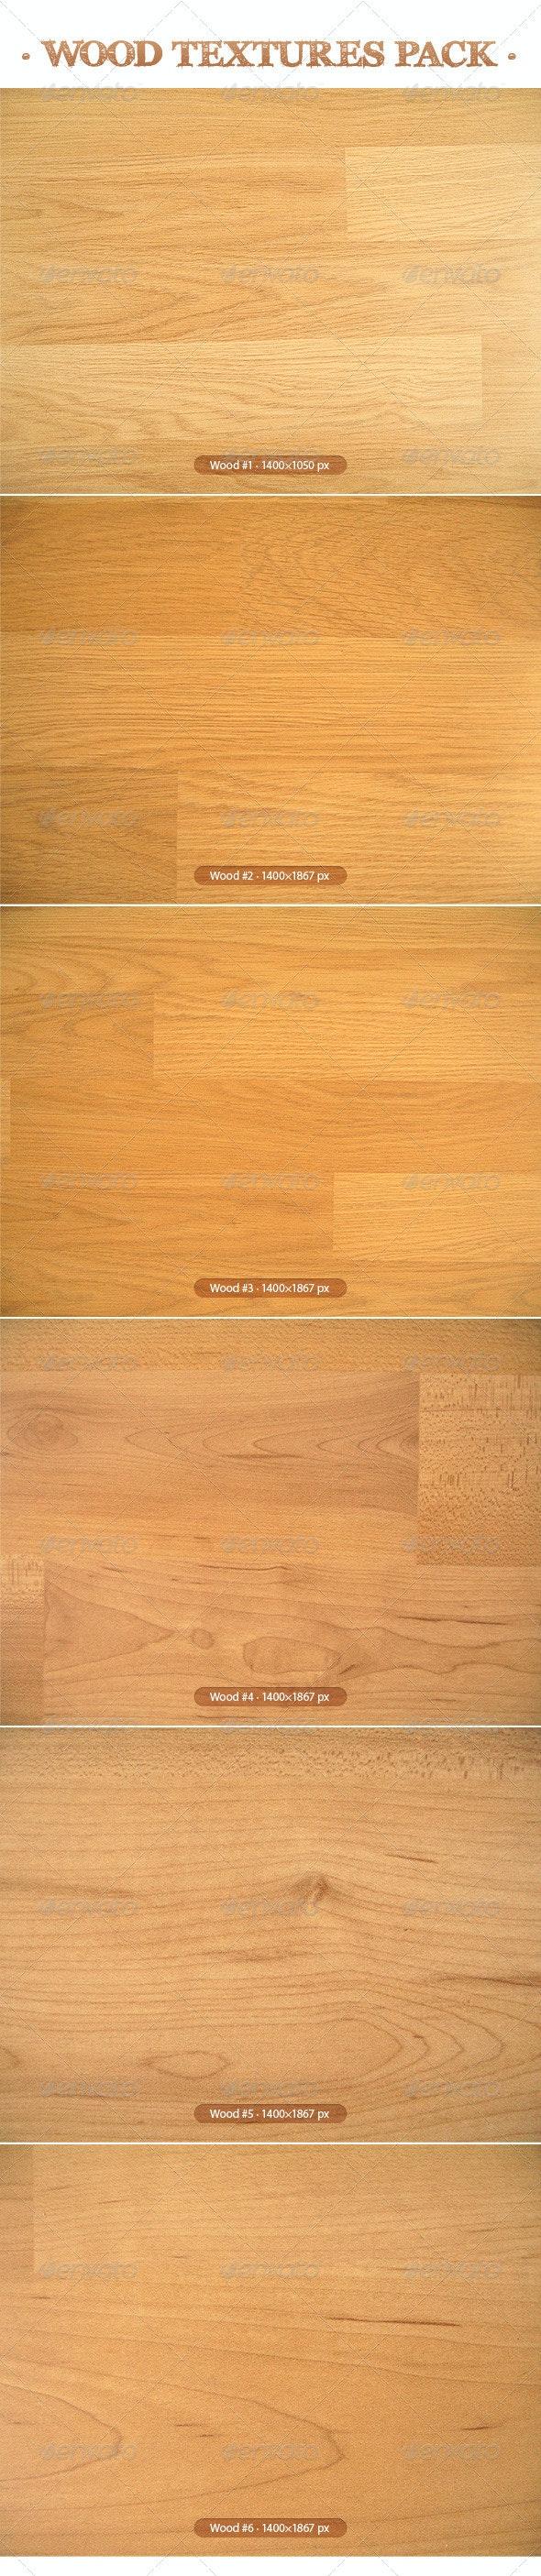 Wood Textures Pack - Wood Textures